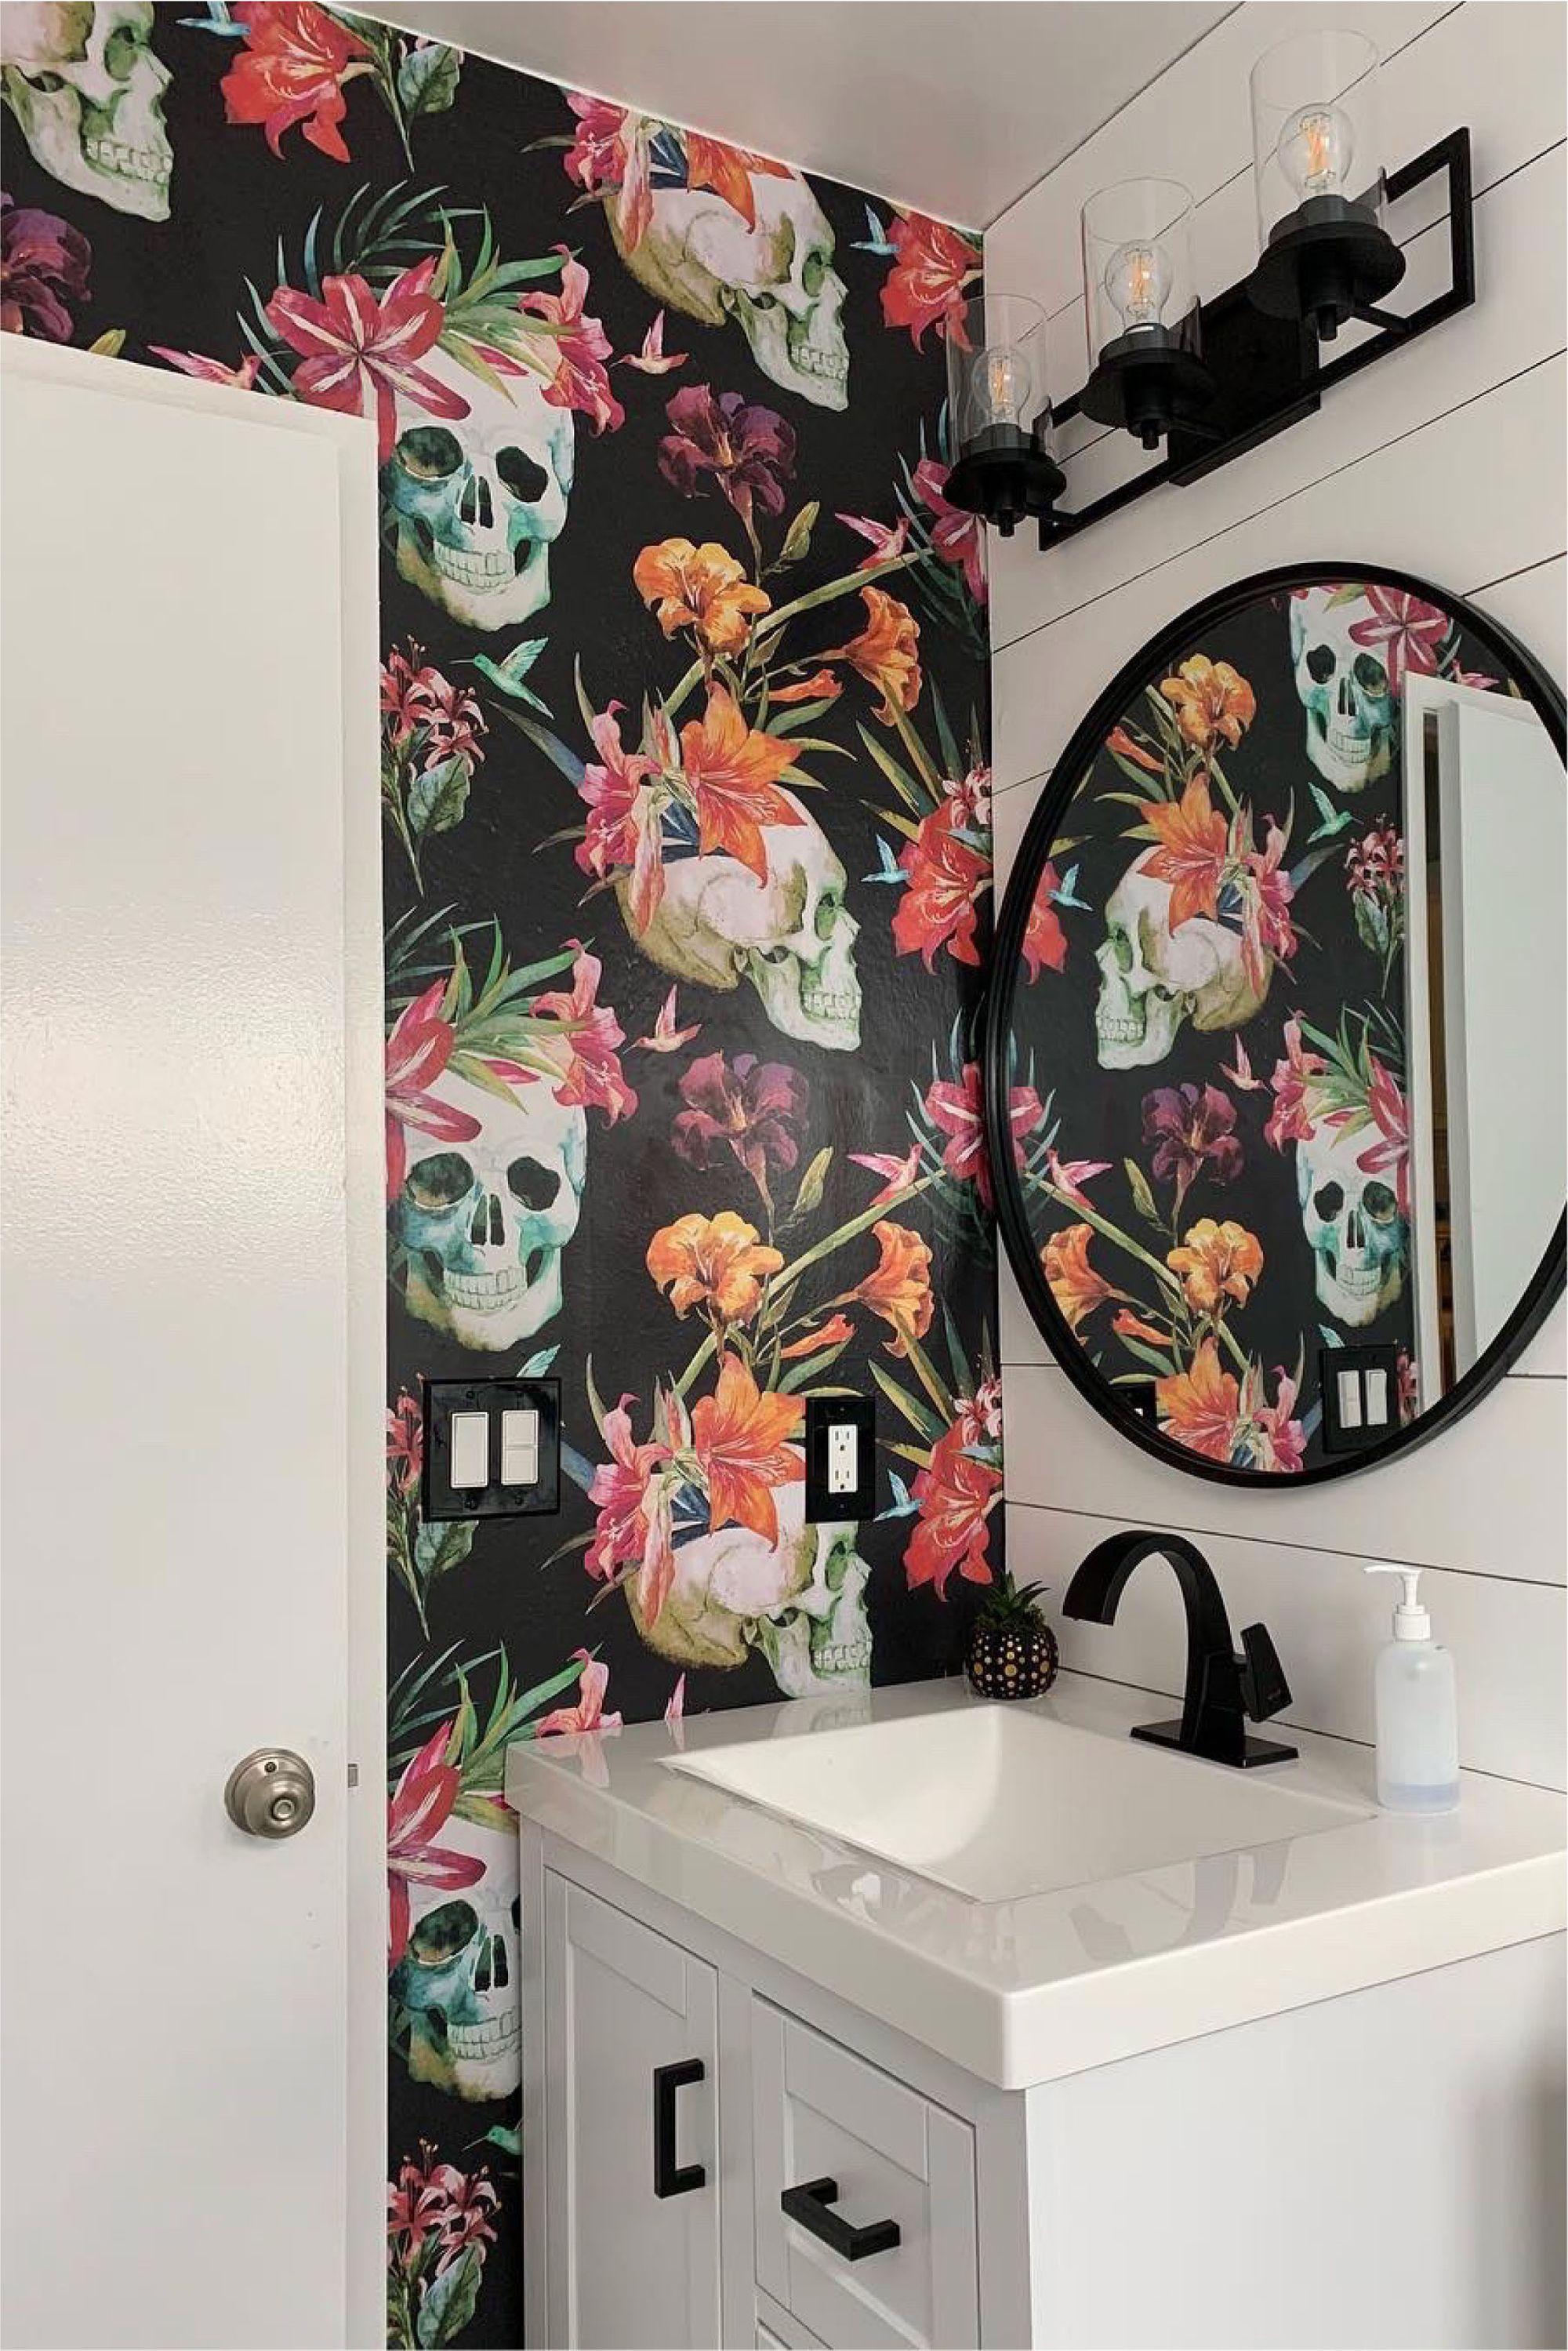 Buried Treasure Black Floral Wallpaper Removable Wallpaper Skull Wallpaper